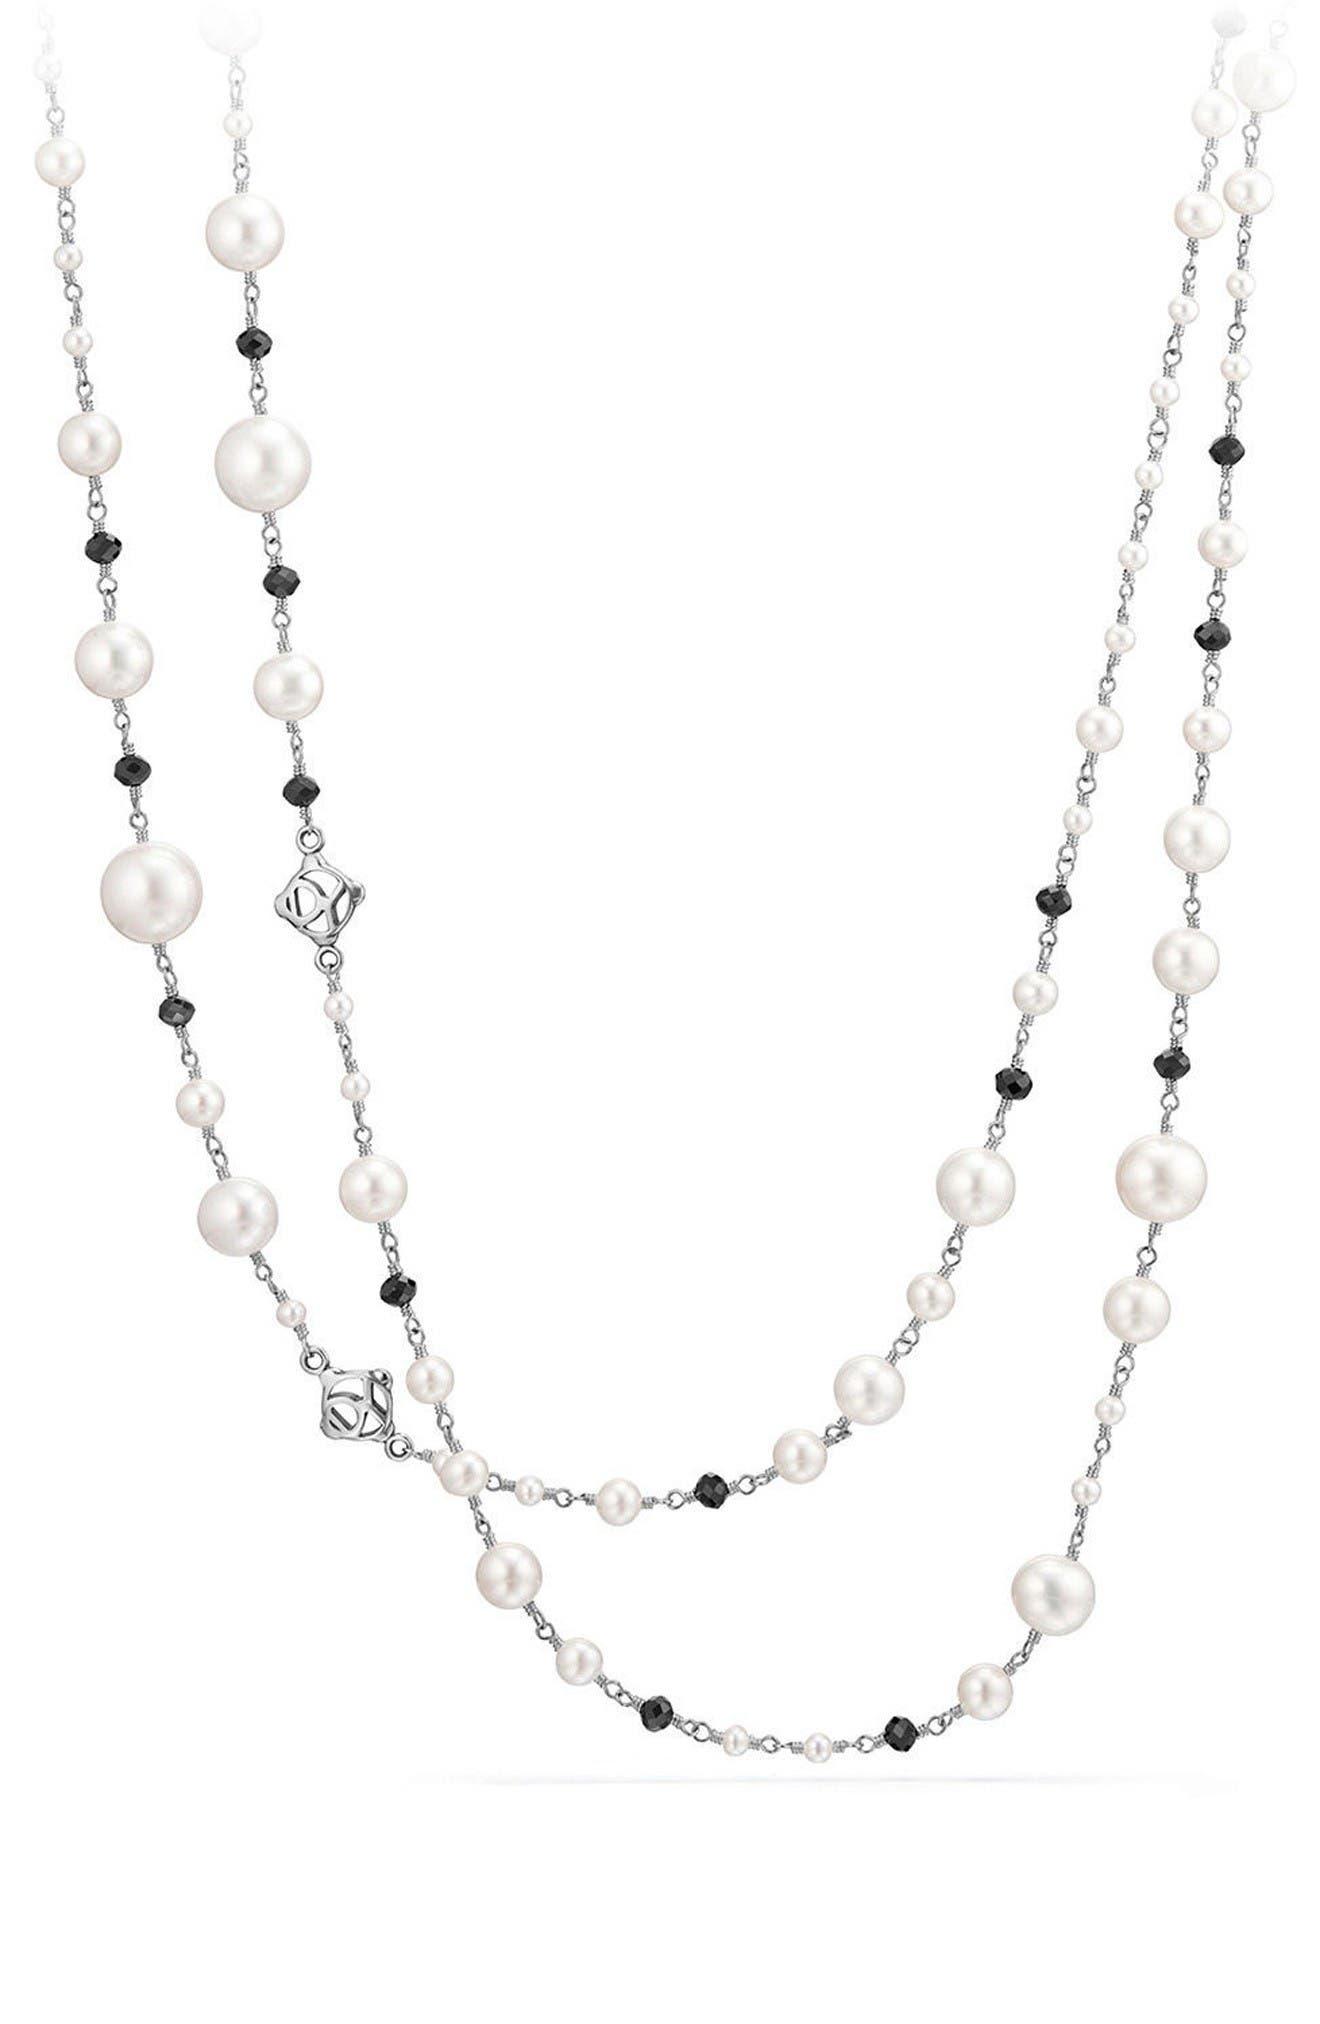 DAVID YURMAN Solari Pearl & Bead Necklace